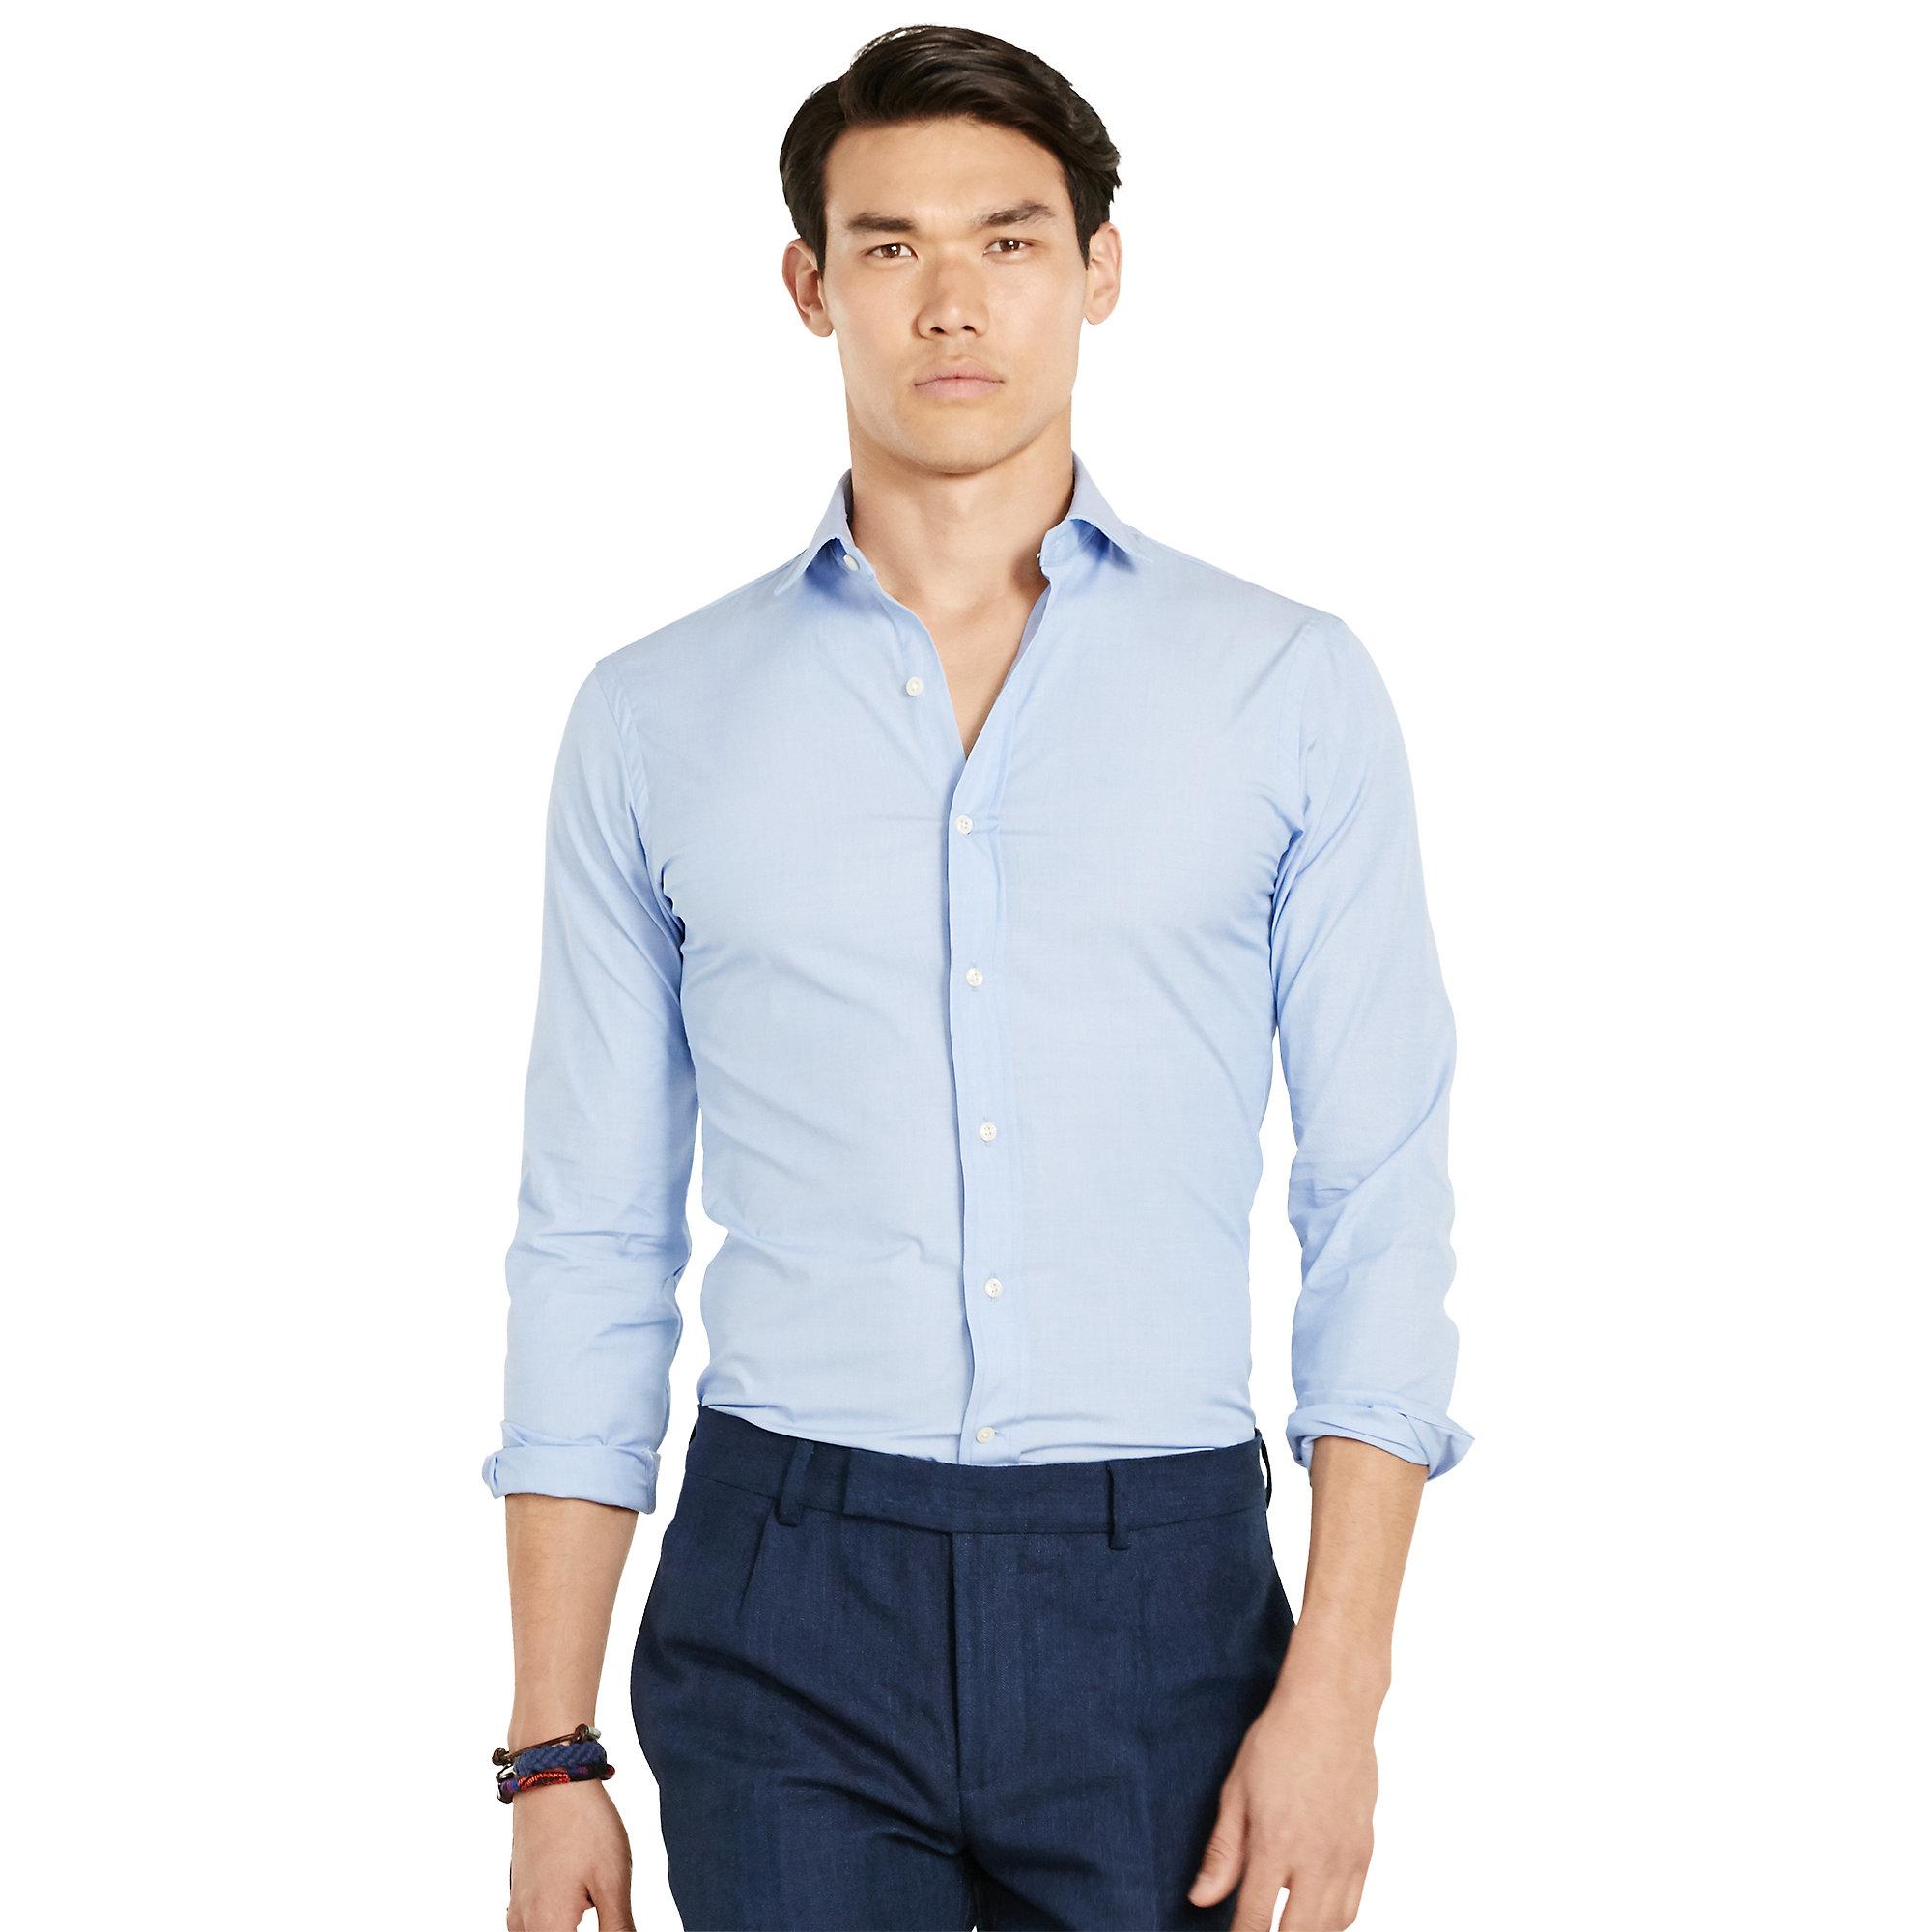 115a8fff9df ... ireland lyst polo ralph lauren estate slim fit stretch shirt in blue  for men 9f7d7 10407